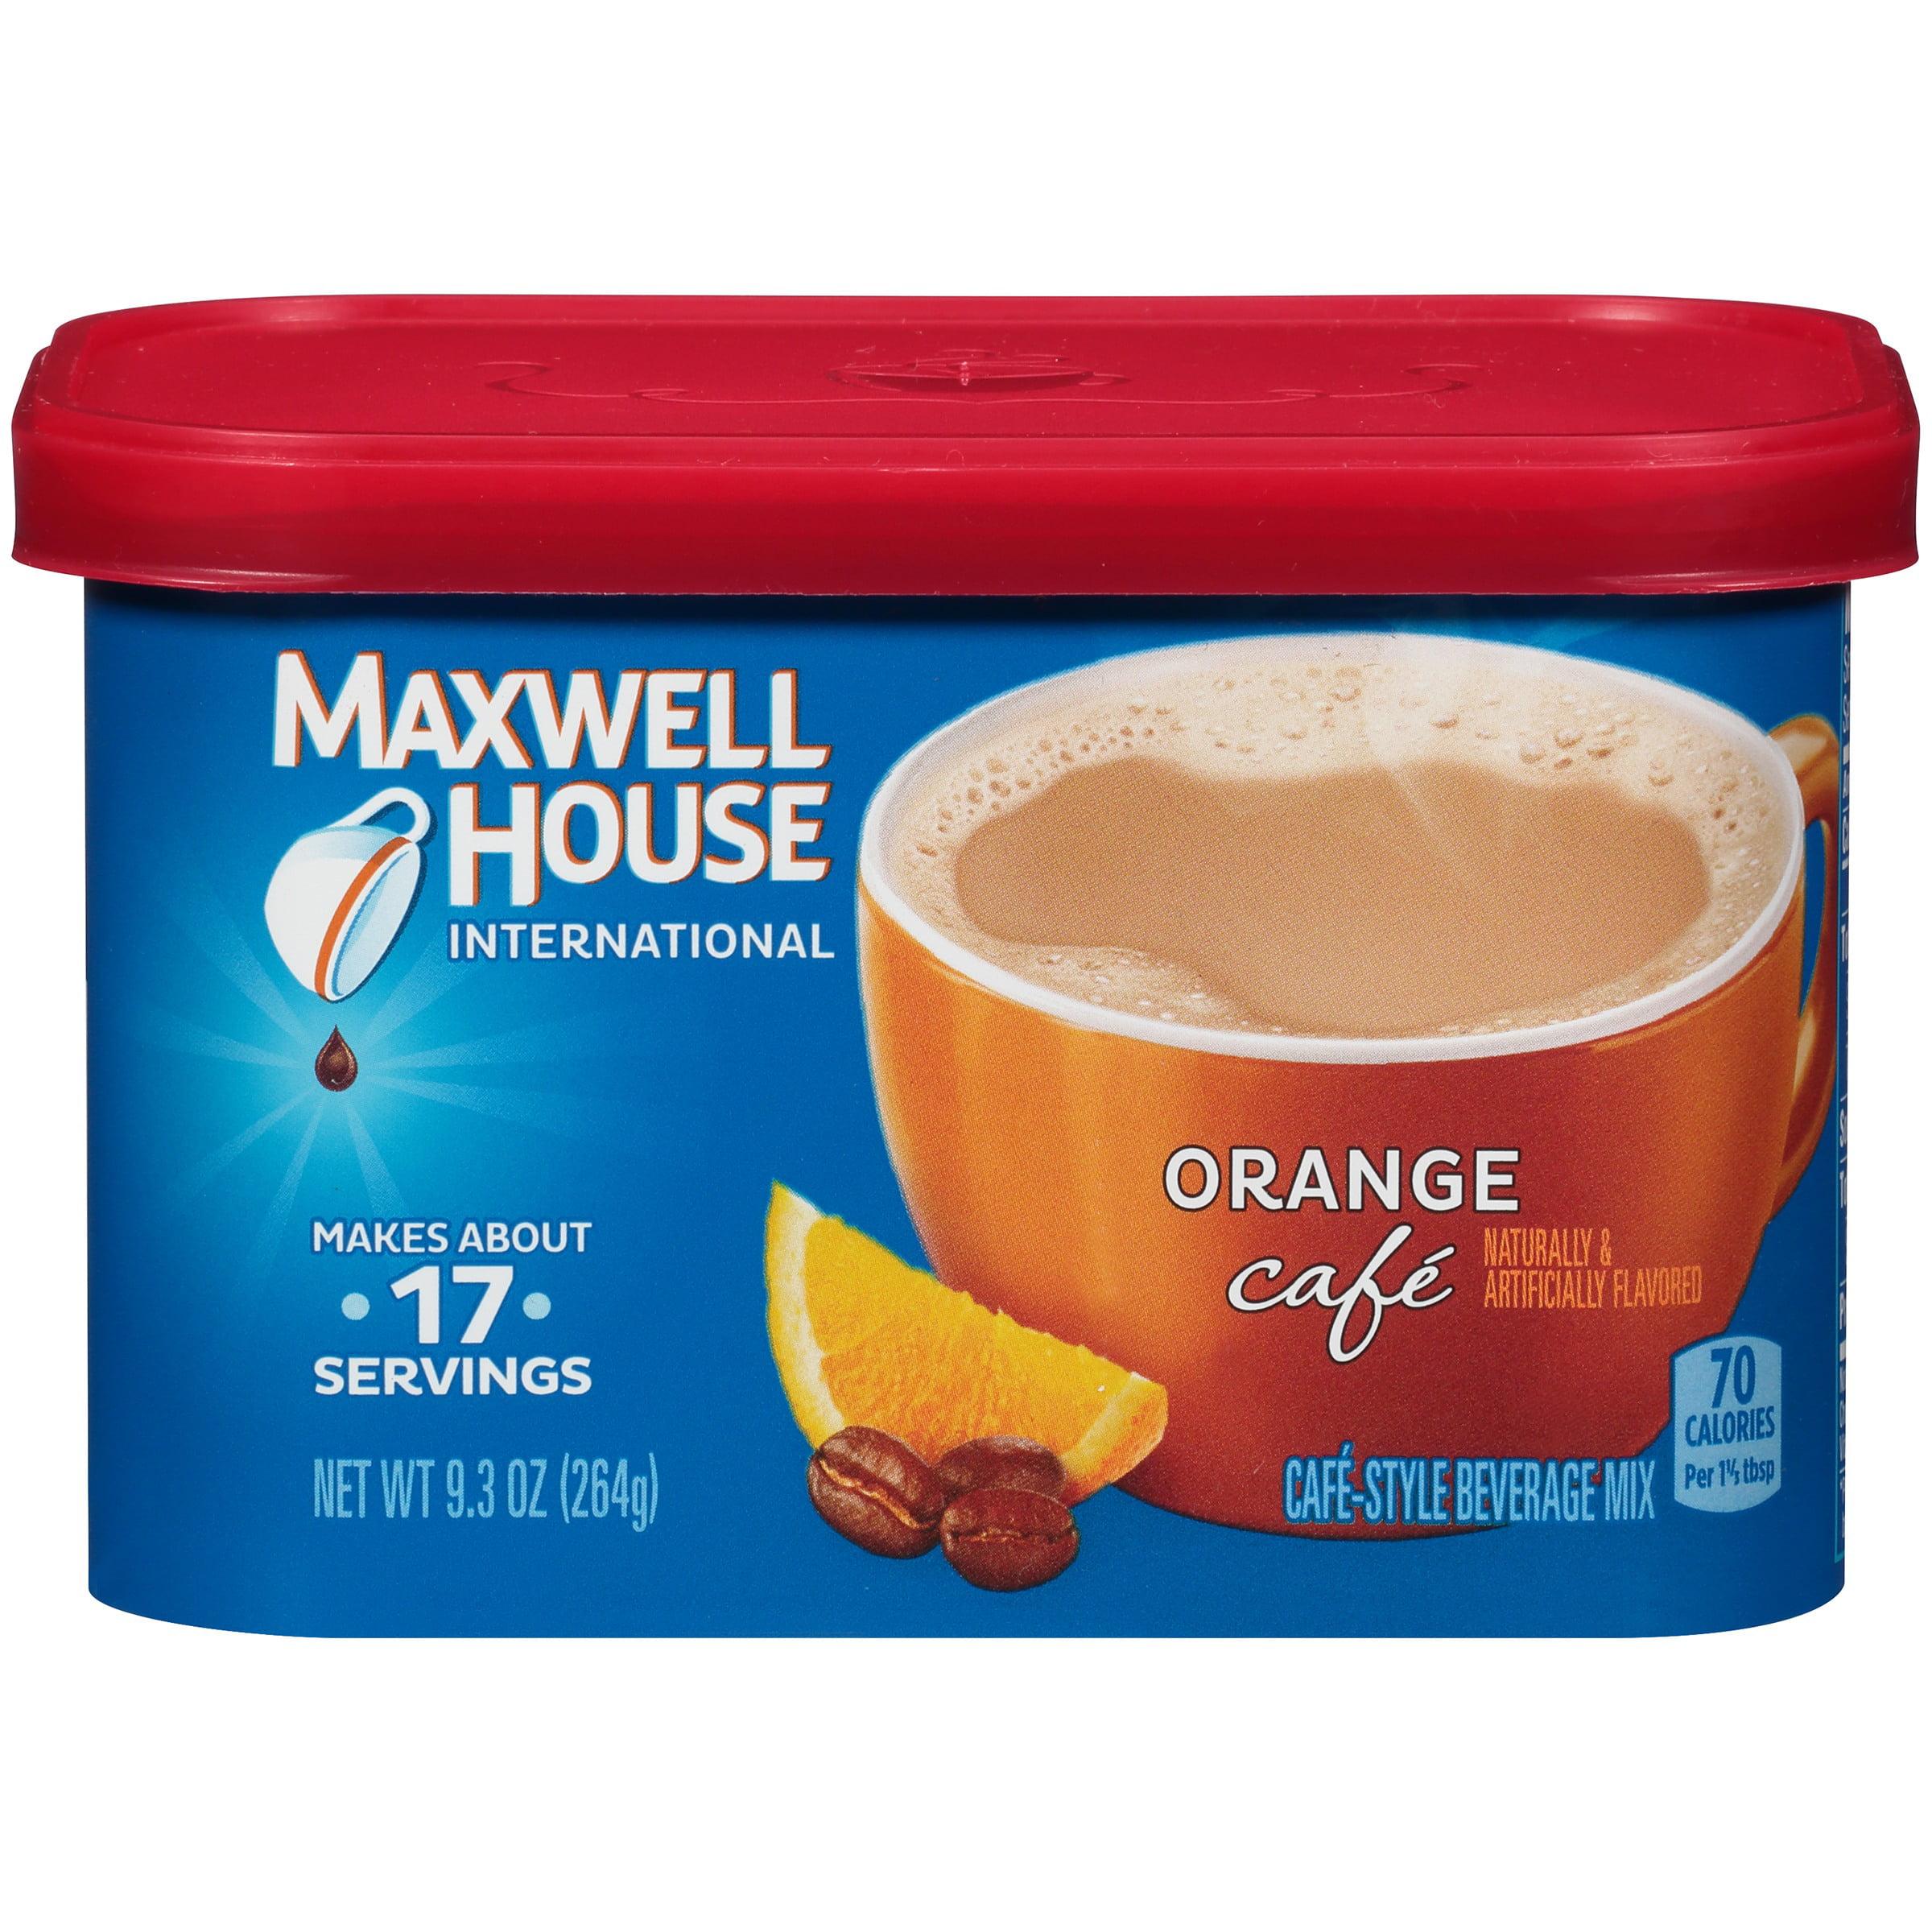 Maxwell House Orange International Cafe Beverage Mix, 9.3 OZ (264g)